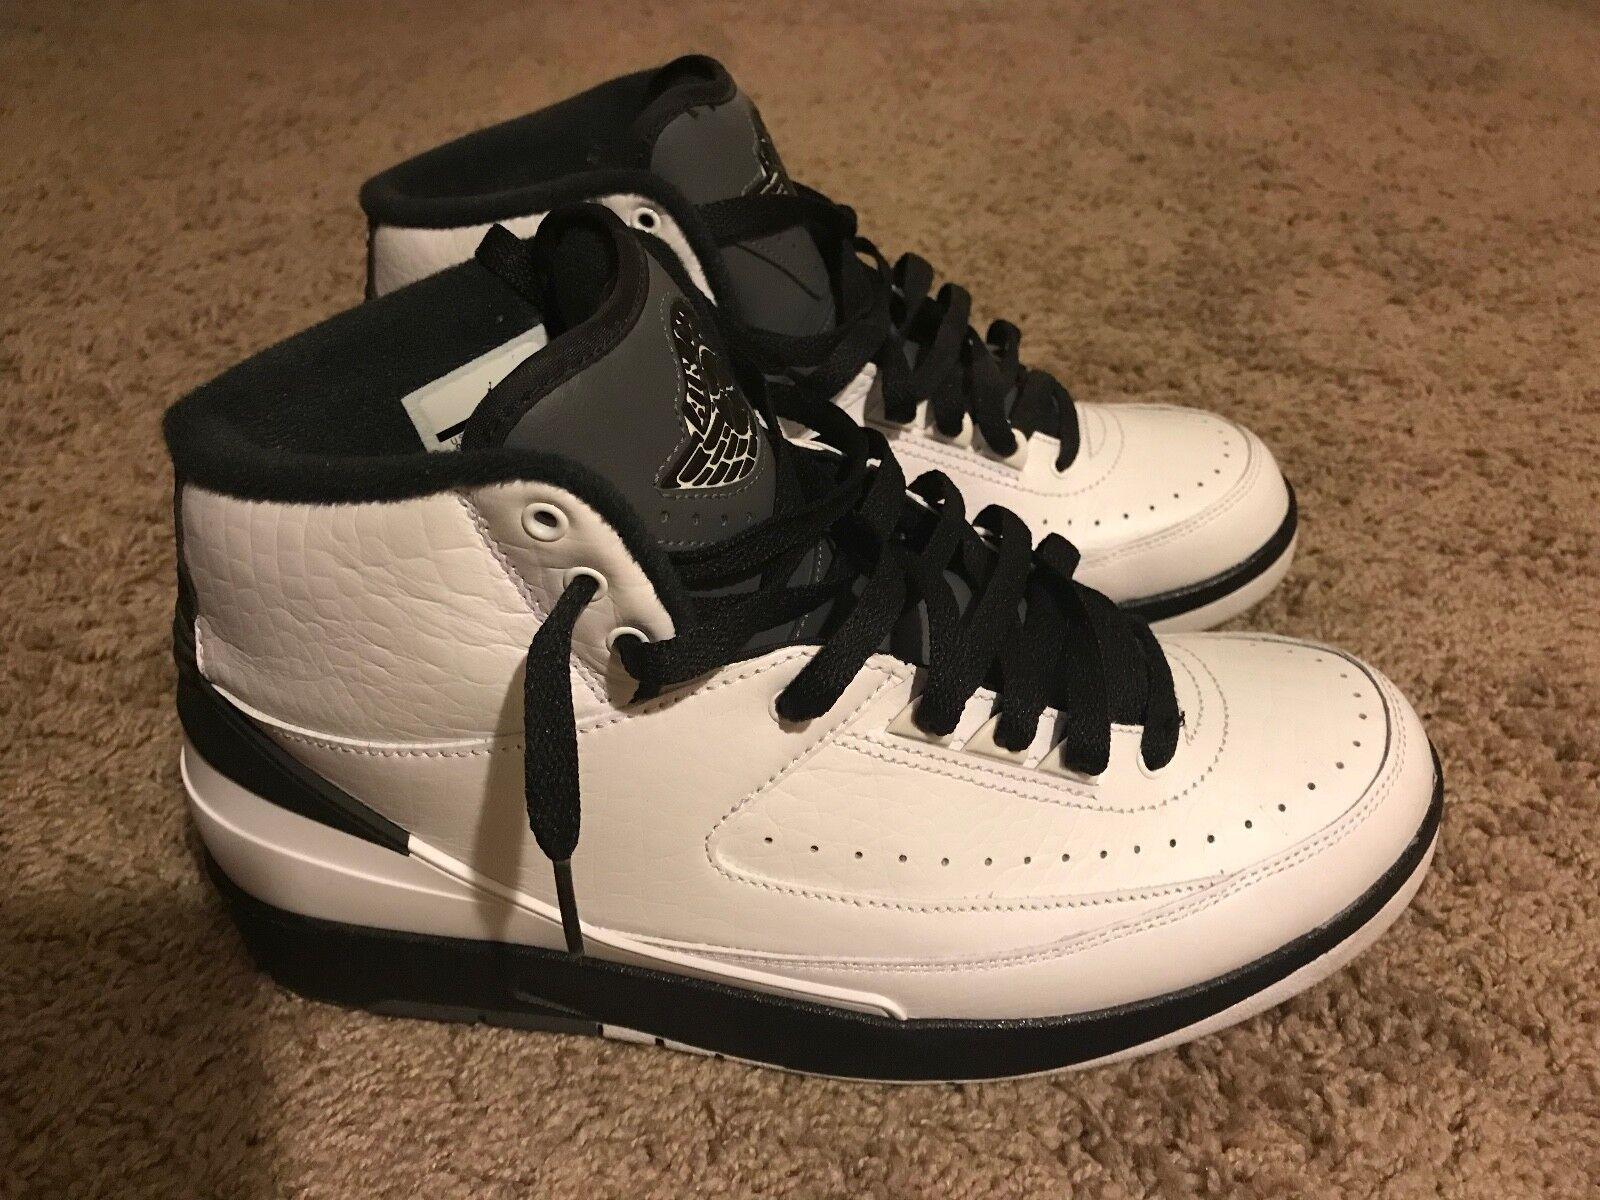 Nike Air Jordan 2 II Retro 'Wing it' White Black Size 9.5